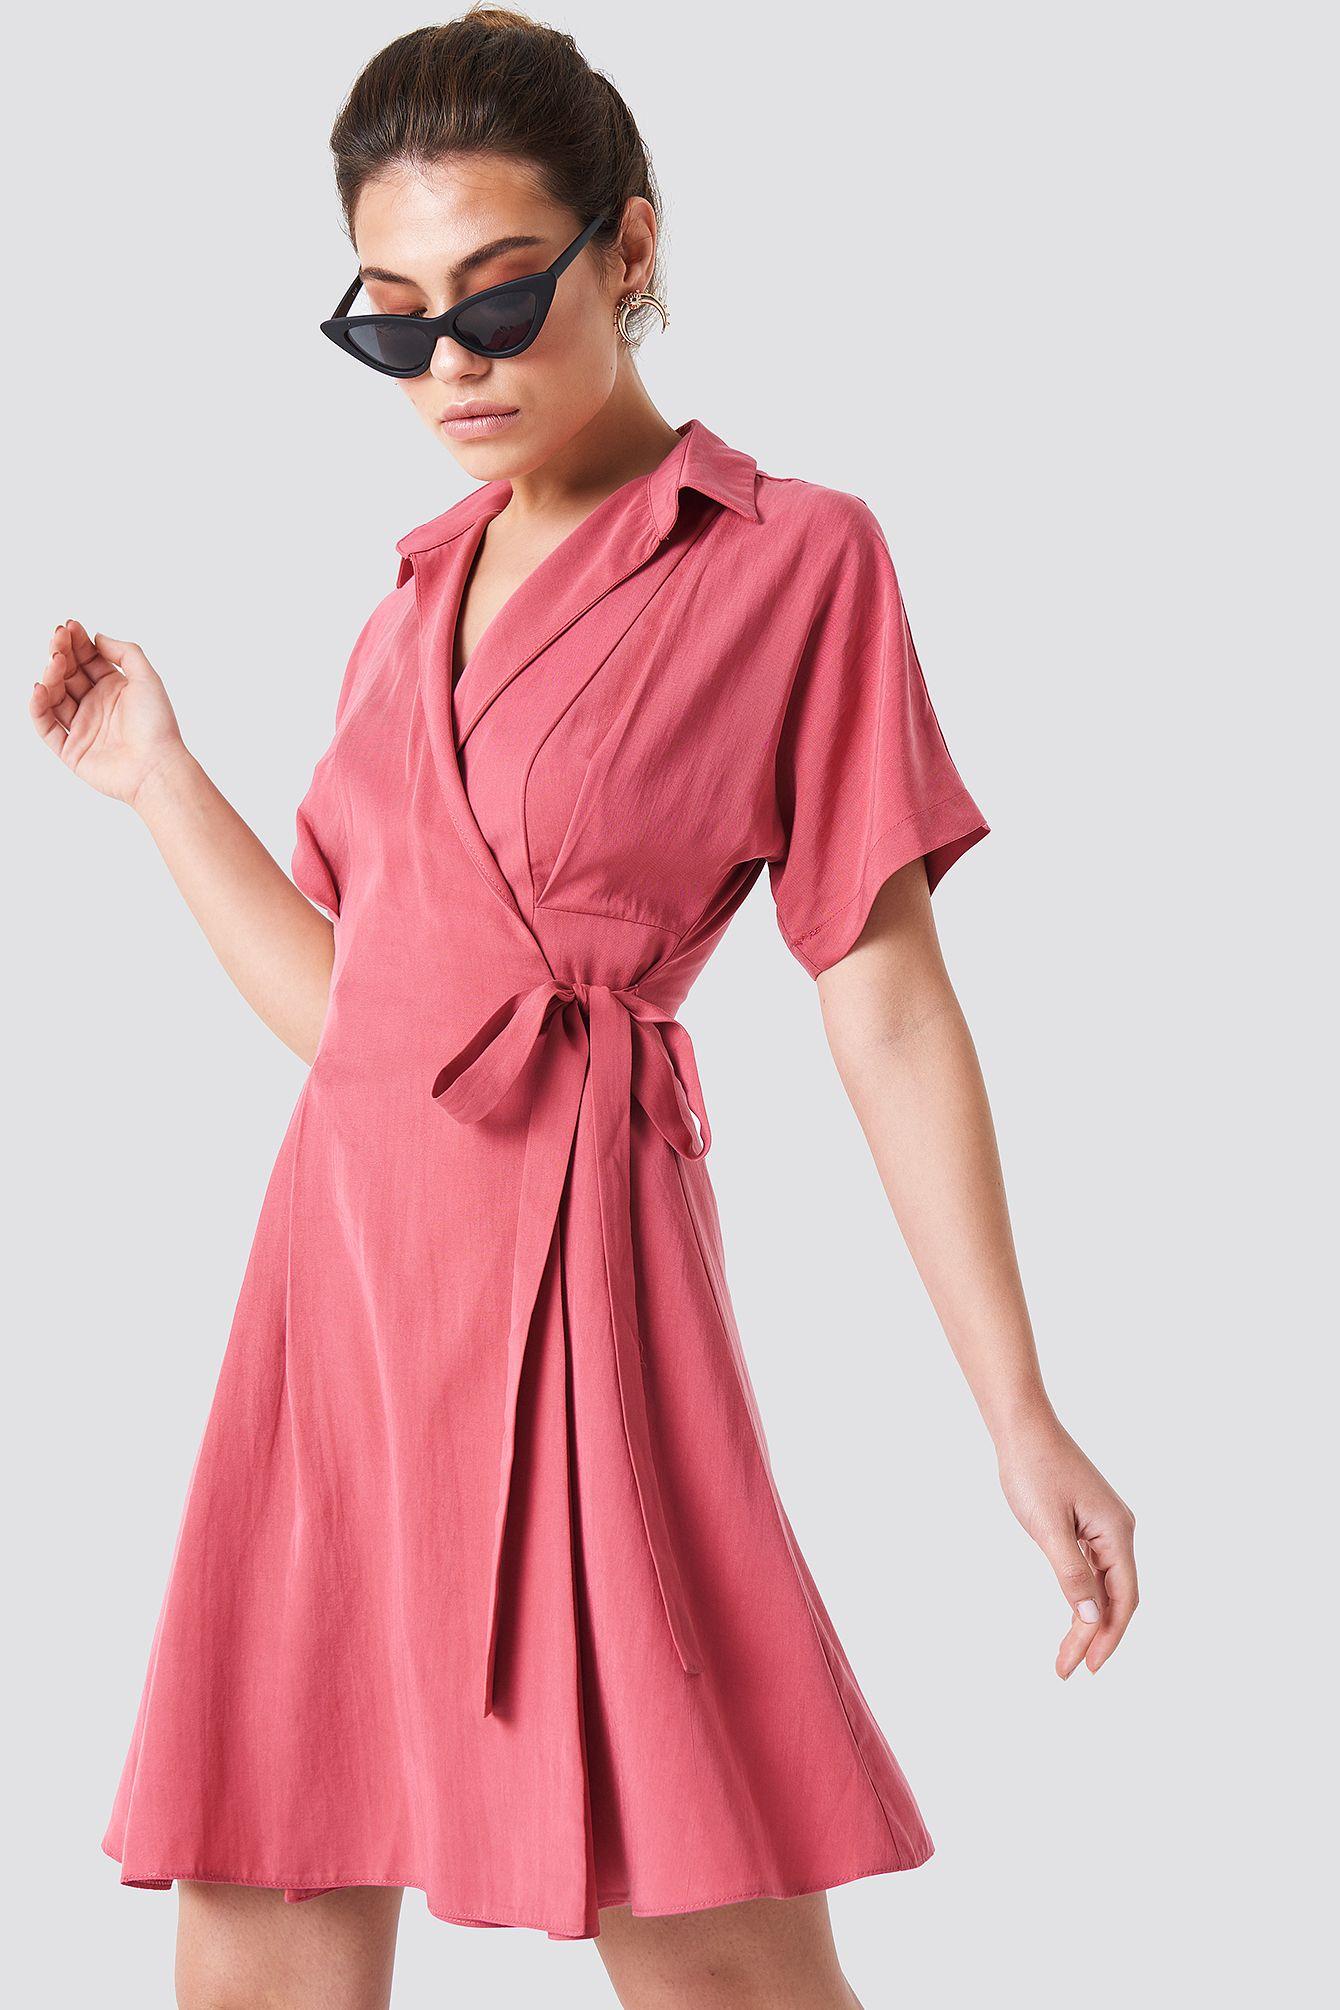 Trendyol Wrap Around Midi Dress Pink Midi Dress Pink Midi Dress Dresses [ 2010 x 1340 Pixel ]